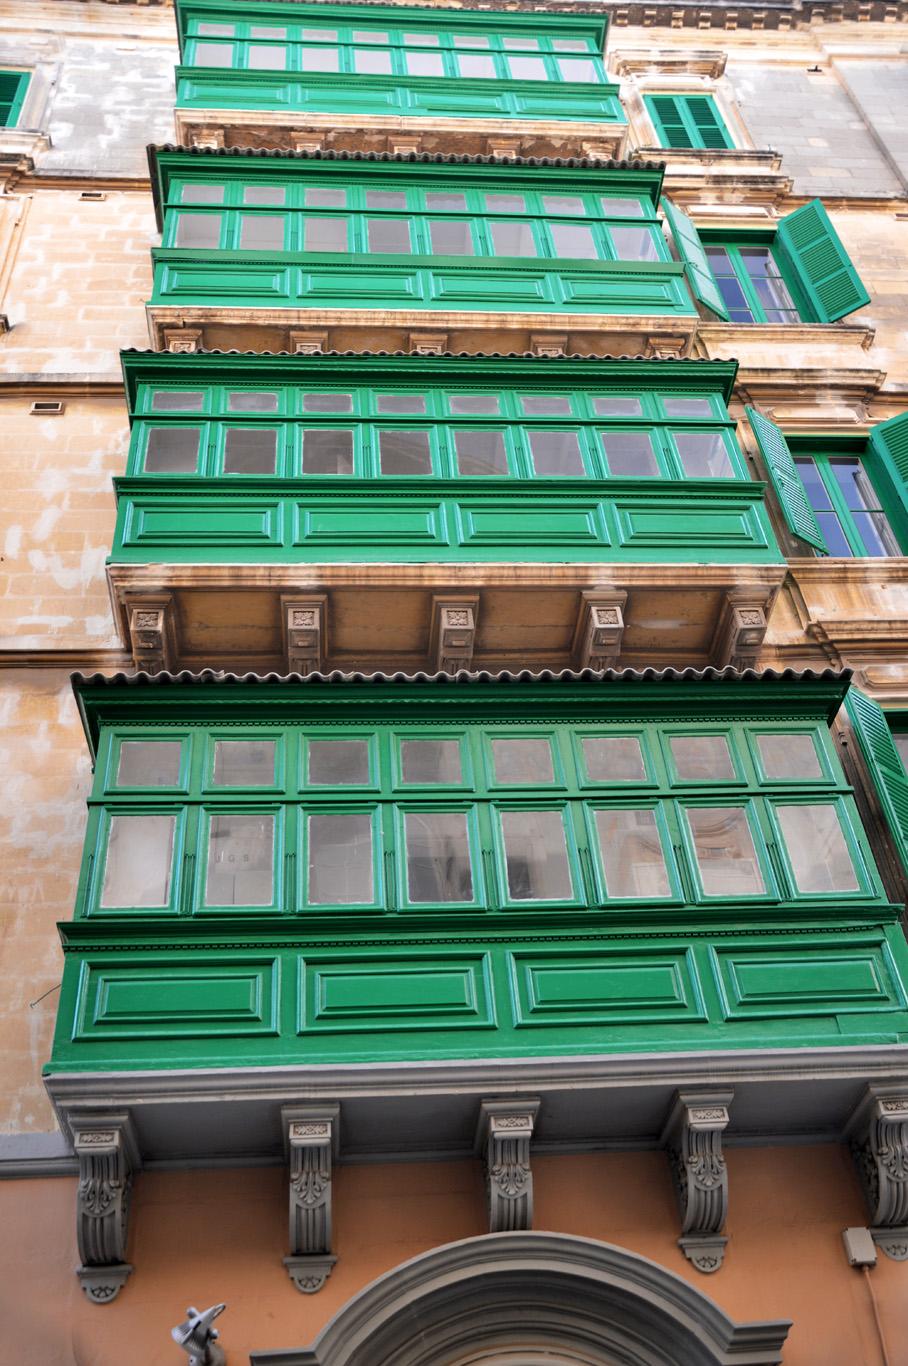 Distinctive balconies